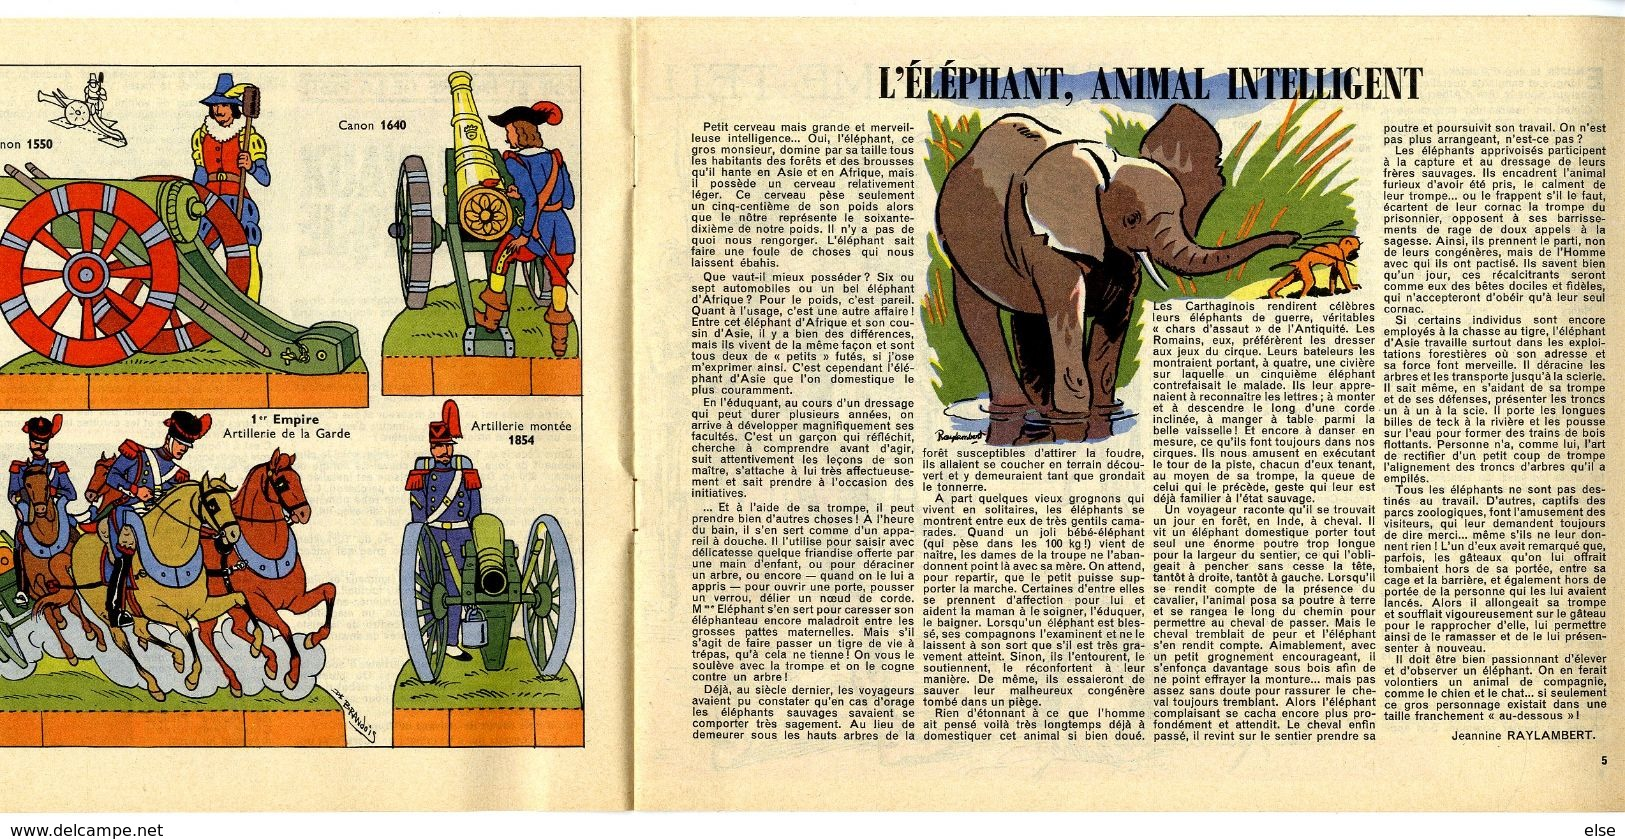 TOTAL JOURNAL 1965 N°44   LES CHEVAUX DE CIRQUE L ELEPHANT  ANIMAL INTELLIGENT  ETC ... 15  PAGES - Boeken, Tijdschriften, Stripverhalen